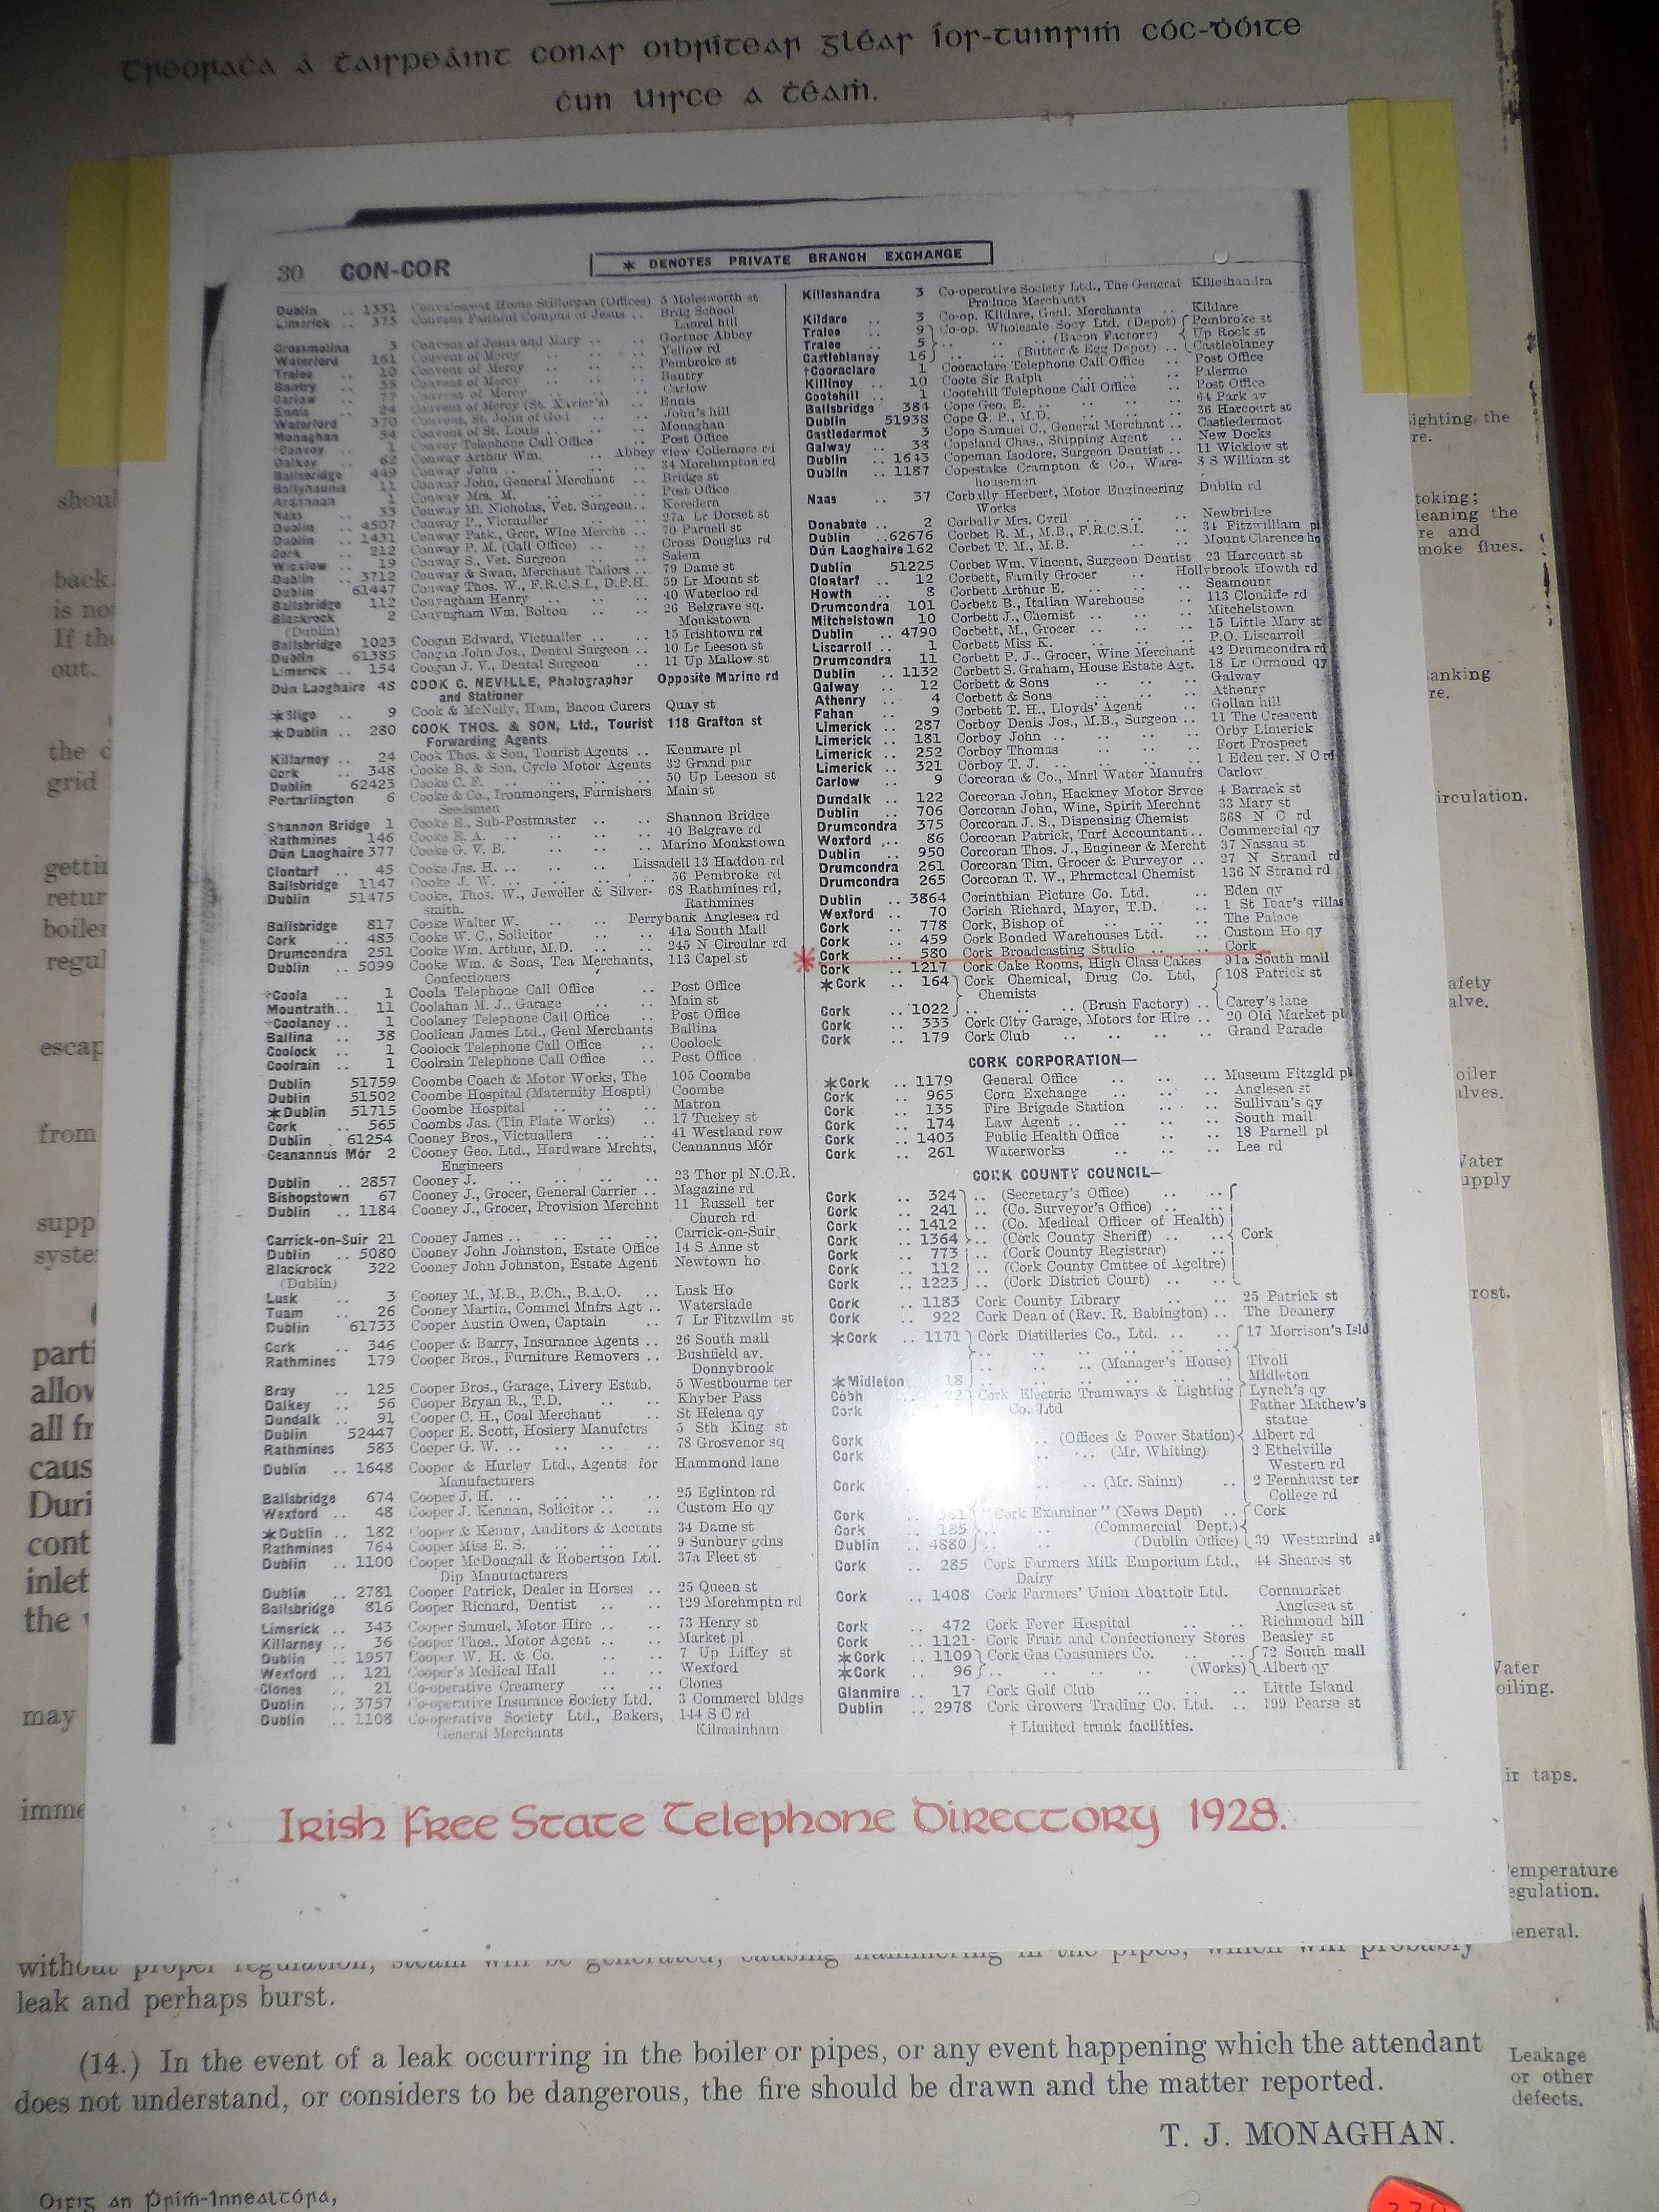 File:Irish Free State telephone directory, 1928 jpg - Wikimedia Commons